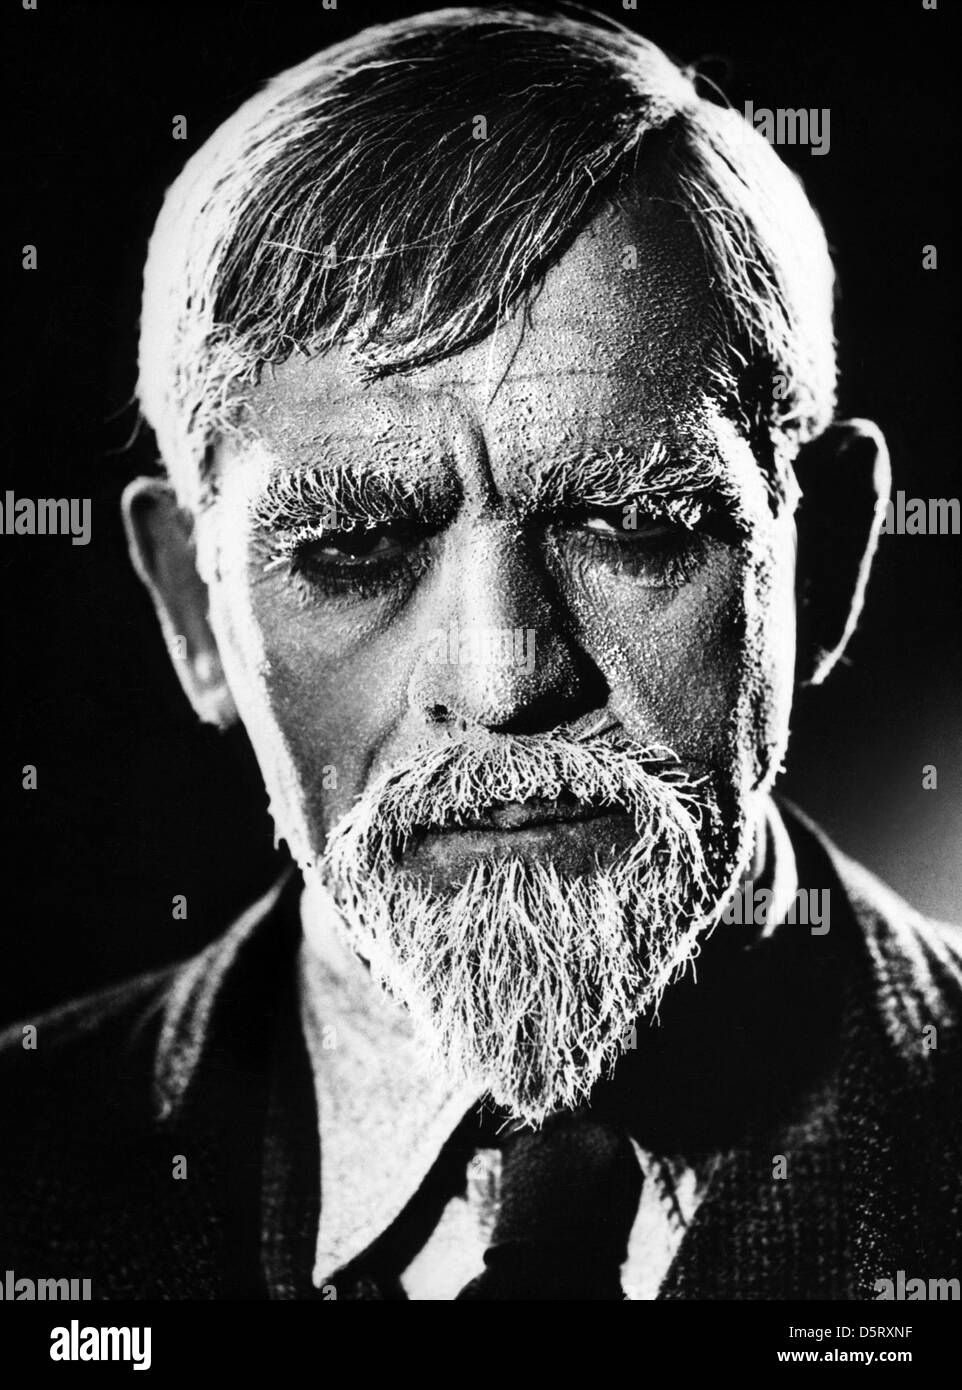 BORIS KARLOFF THE MAN WITH NINE LIVES (1940) Stock Photo